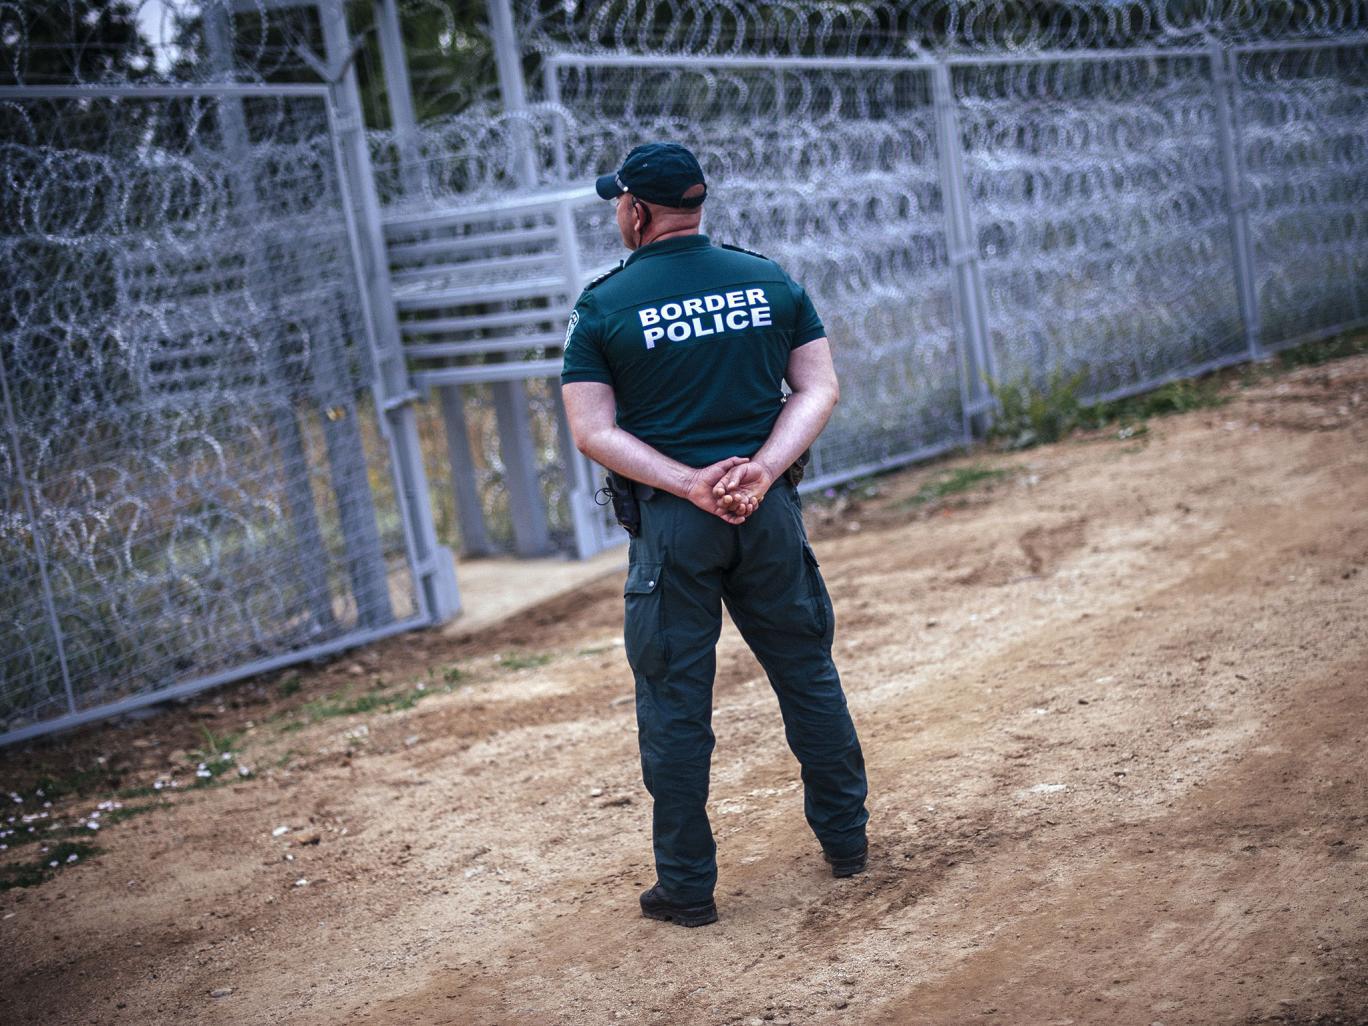 قتل پناهجوی افغان توسط پلیس بلغارستان در مرز ترکیه